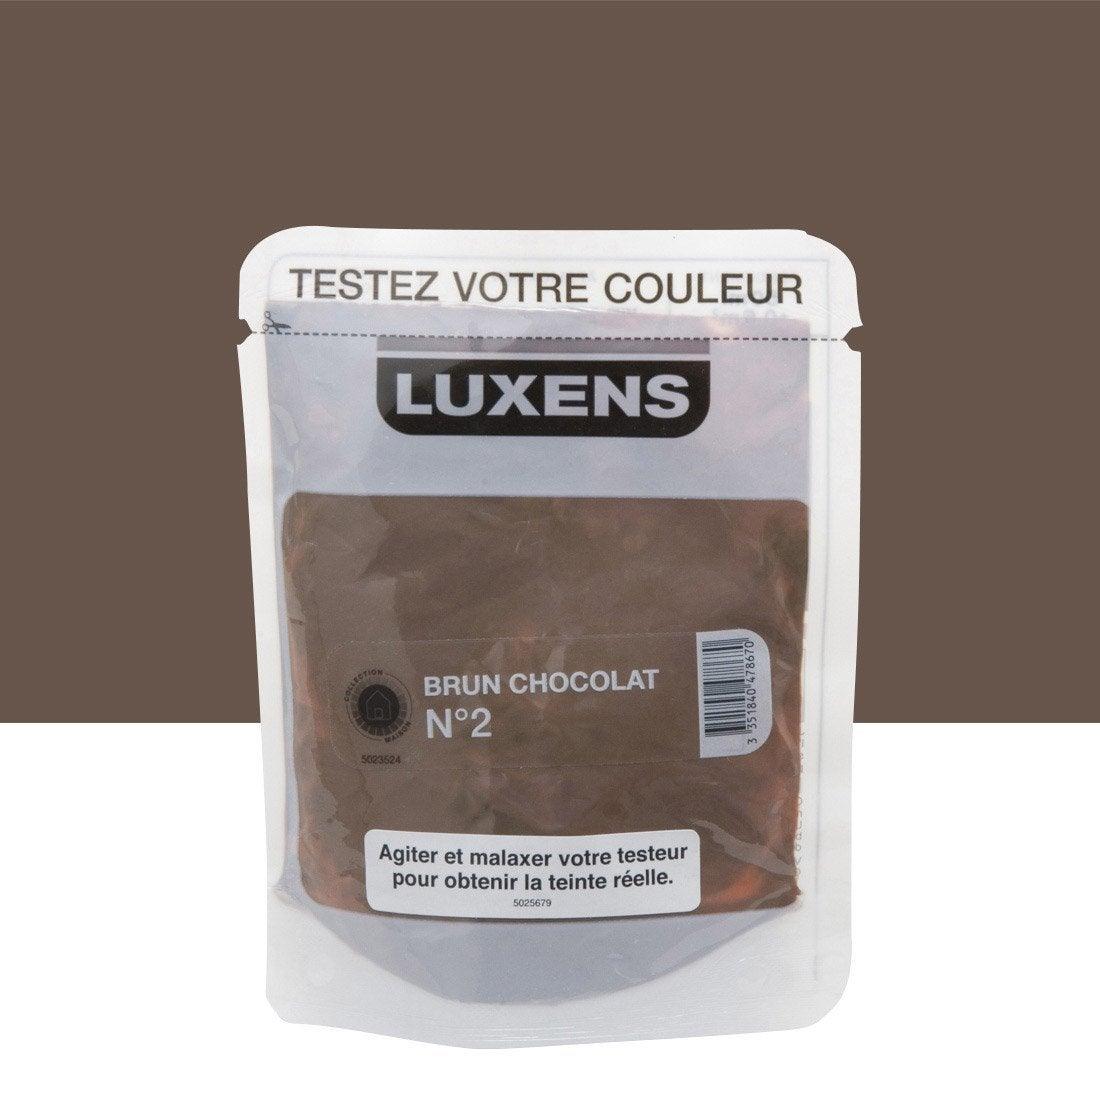 testeur peinture brun chocolat 2 luxens couleurs int rieures satin l leroy merlin. Black Bedroom Furniture Sets. Home Design Ideas